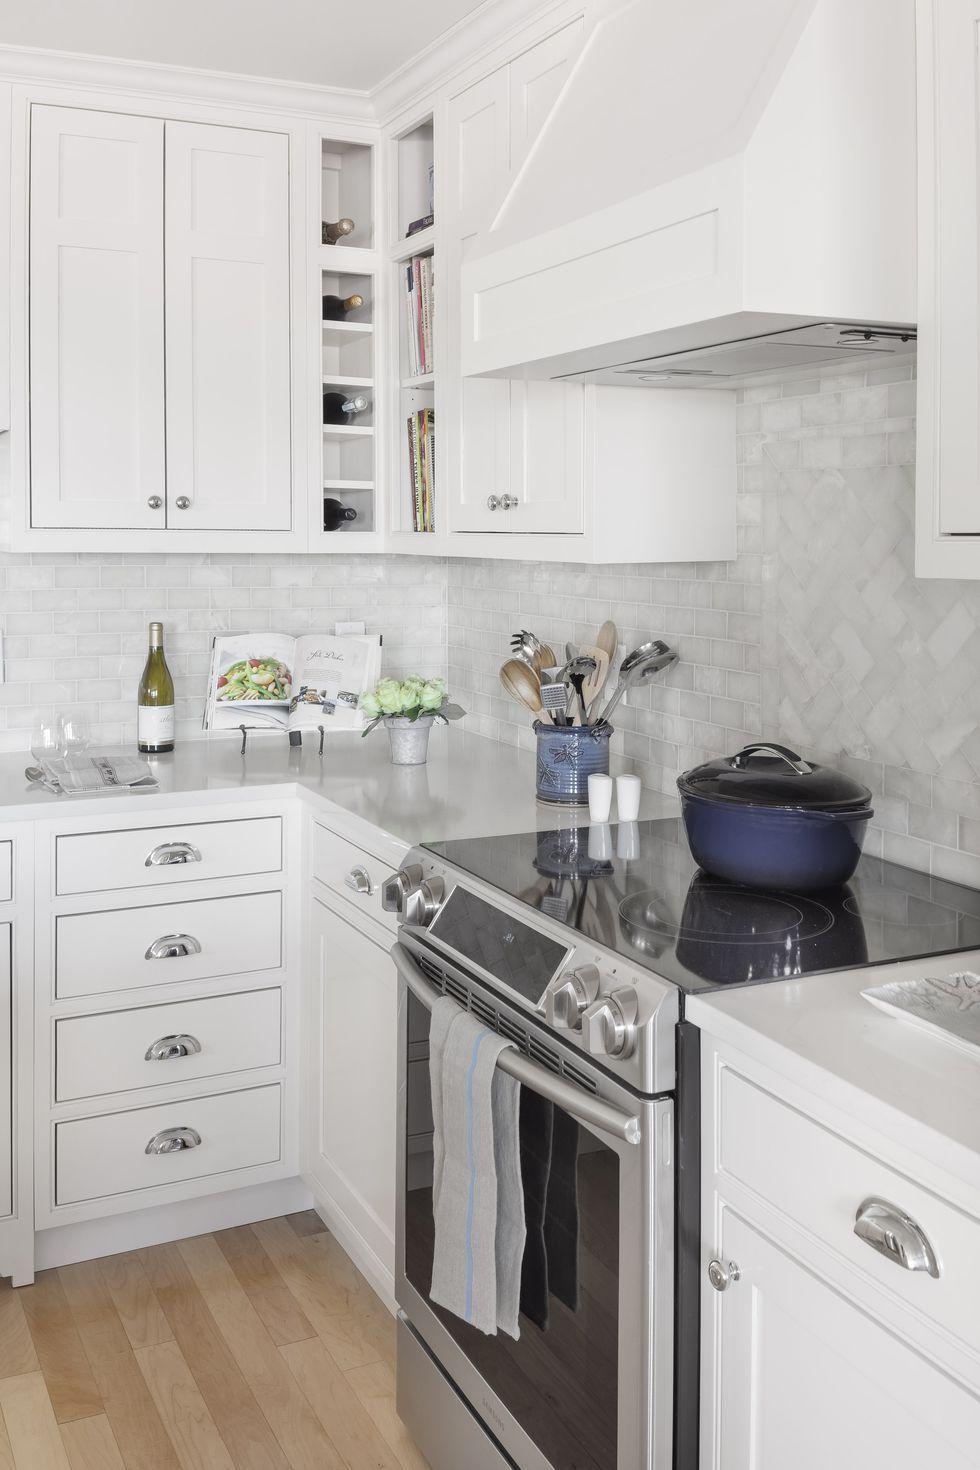 Design by Jeanne Finnerty & 20 Gorgeous Kitchen Tile Backsplashes - Best Kitchen Tile Ideas